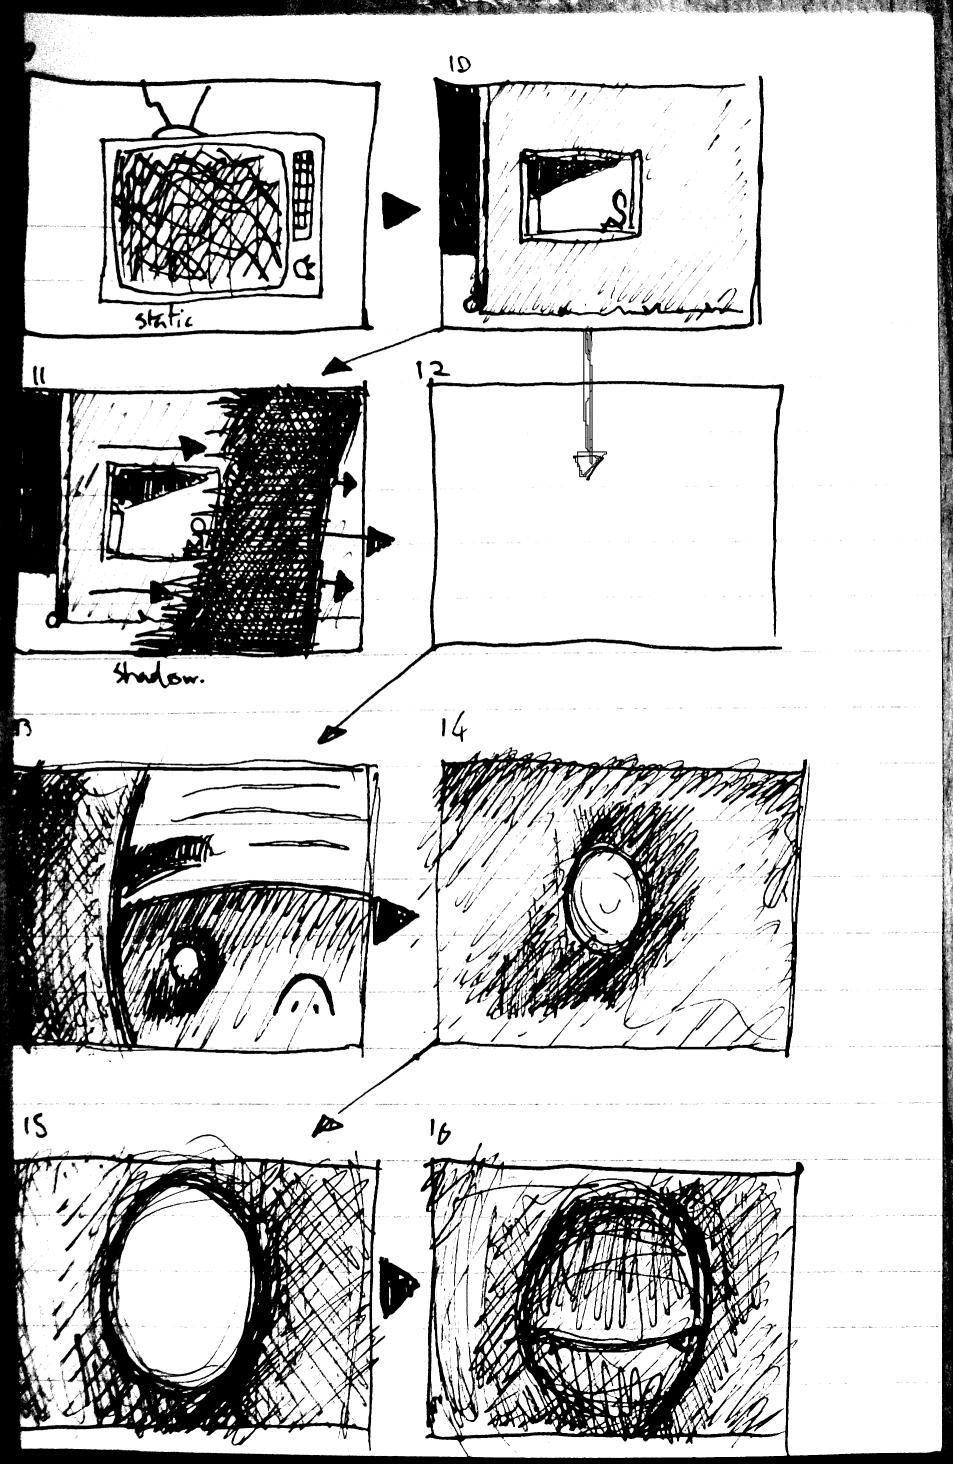 HALLOWEEN2010 Storyboards #02